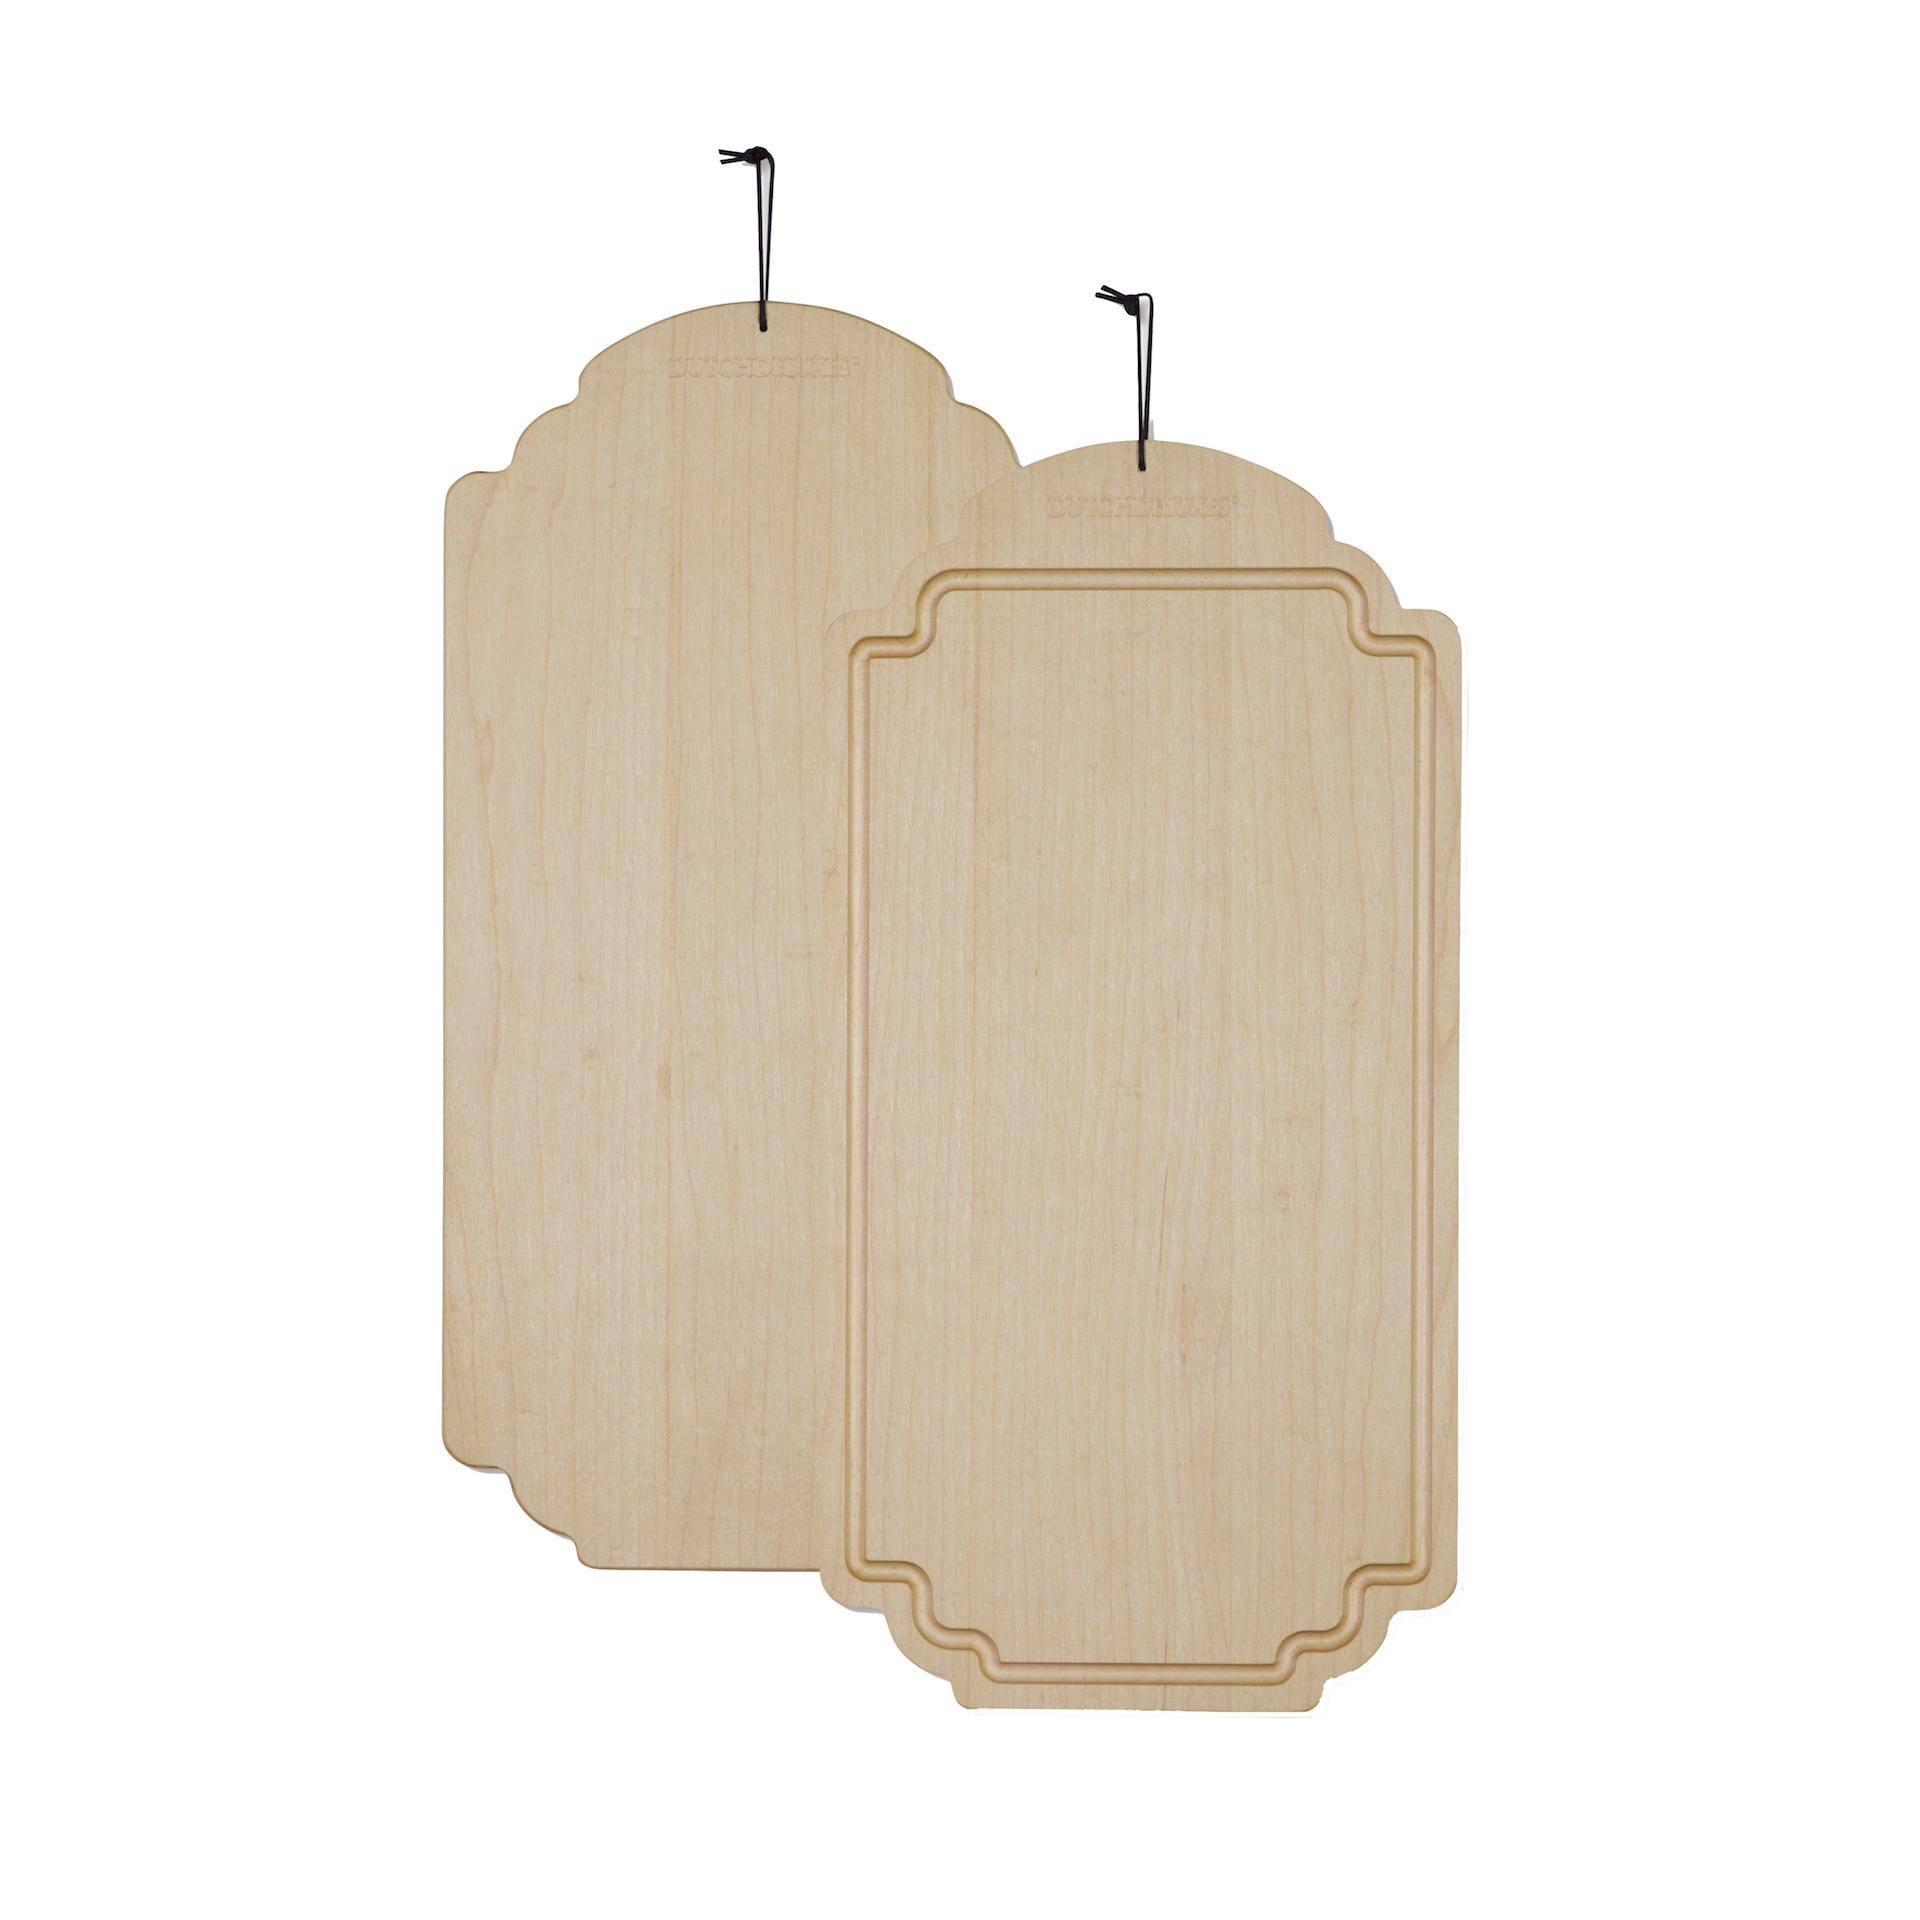 Butter Board Frame